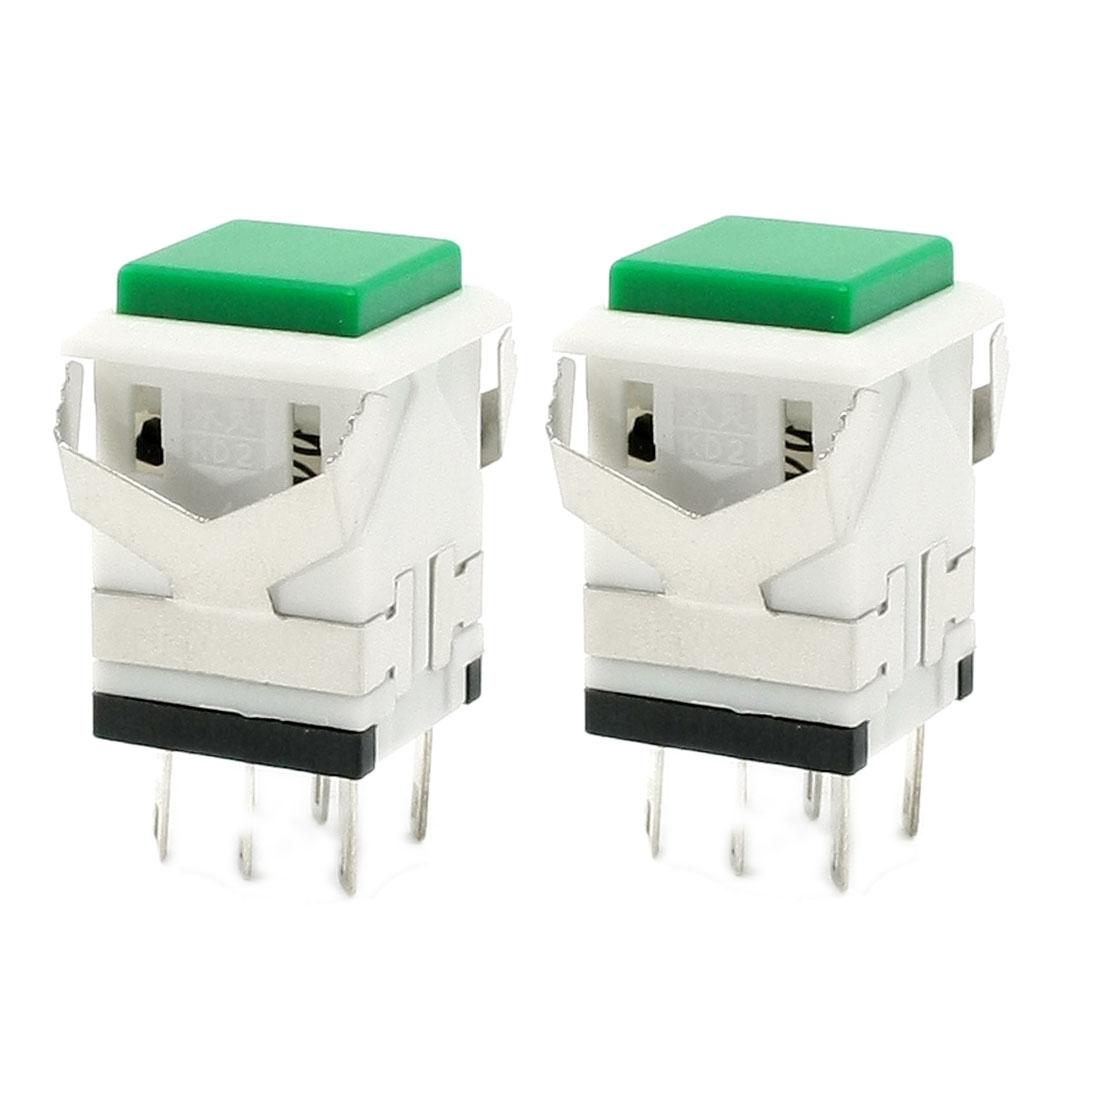 2 Pcs Green Momentary SPDT Push Button Switch AC 250V 3A AC 125V 6A